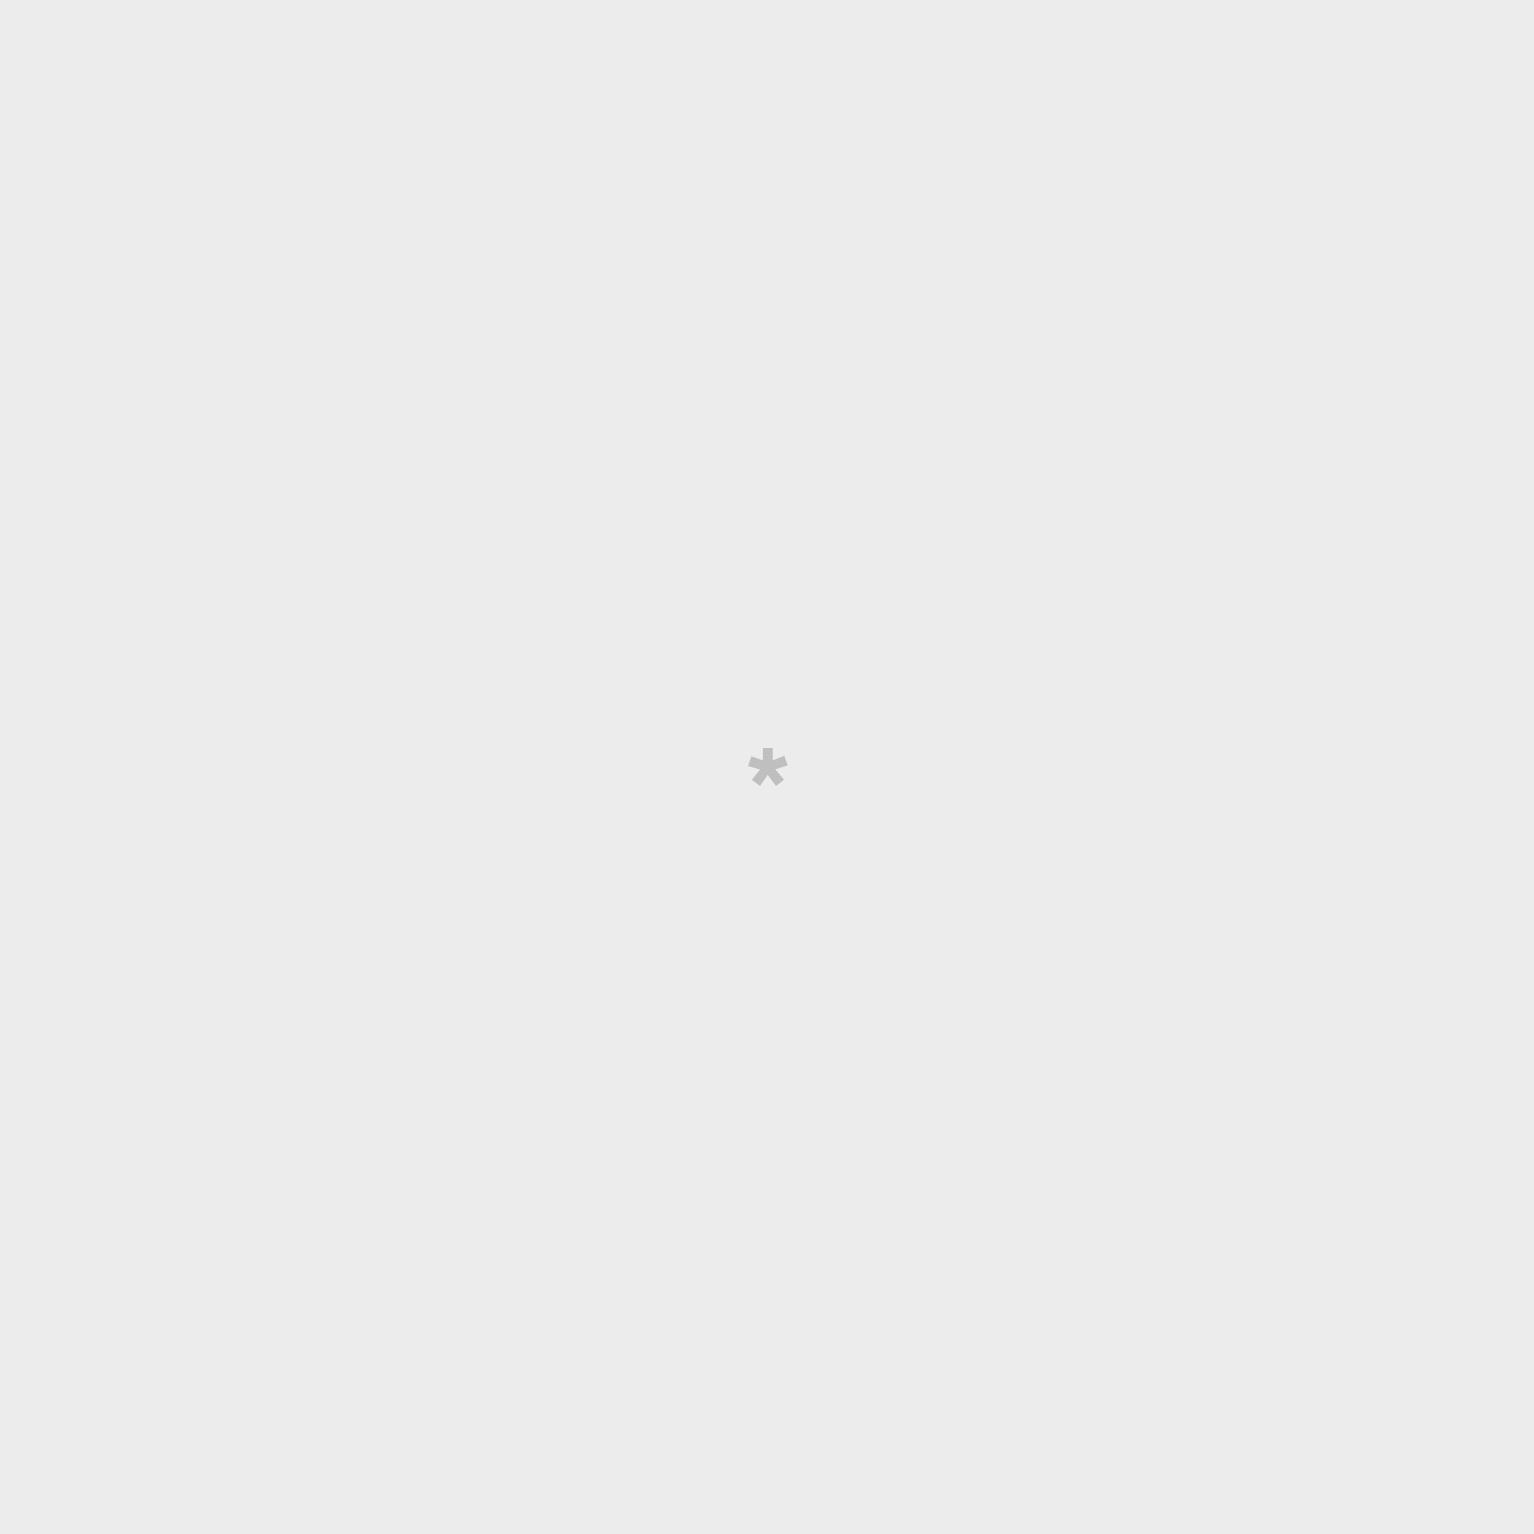 Watch Wonderful Time - IPG & grey